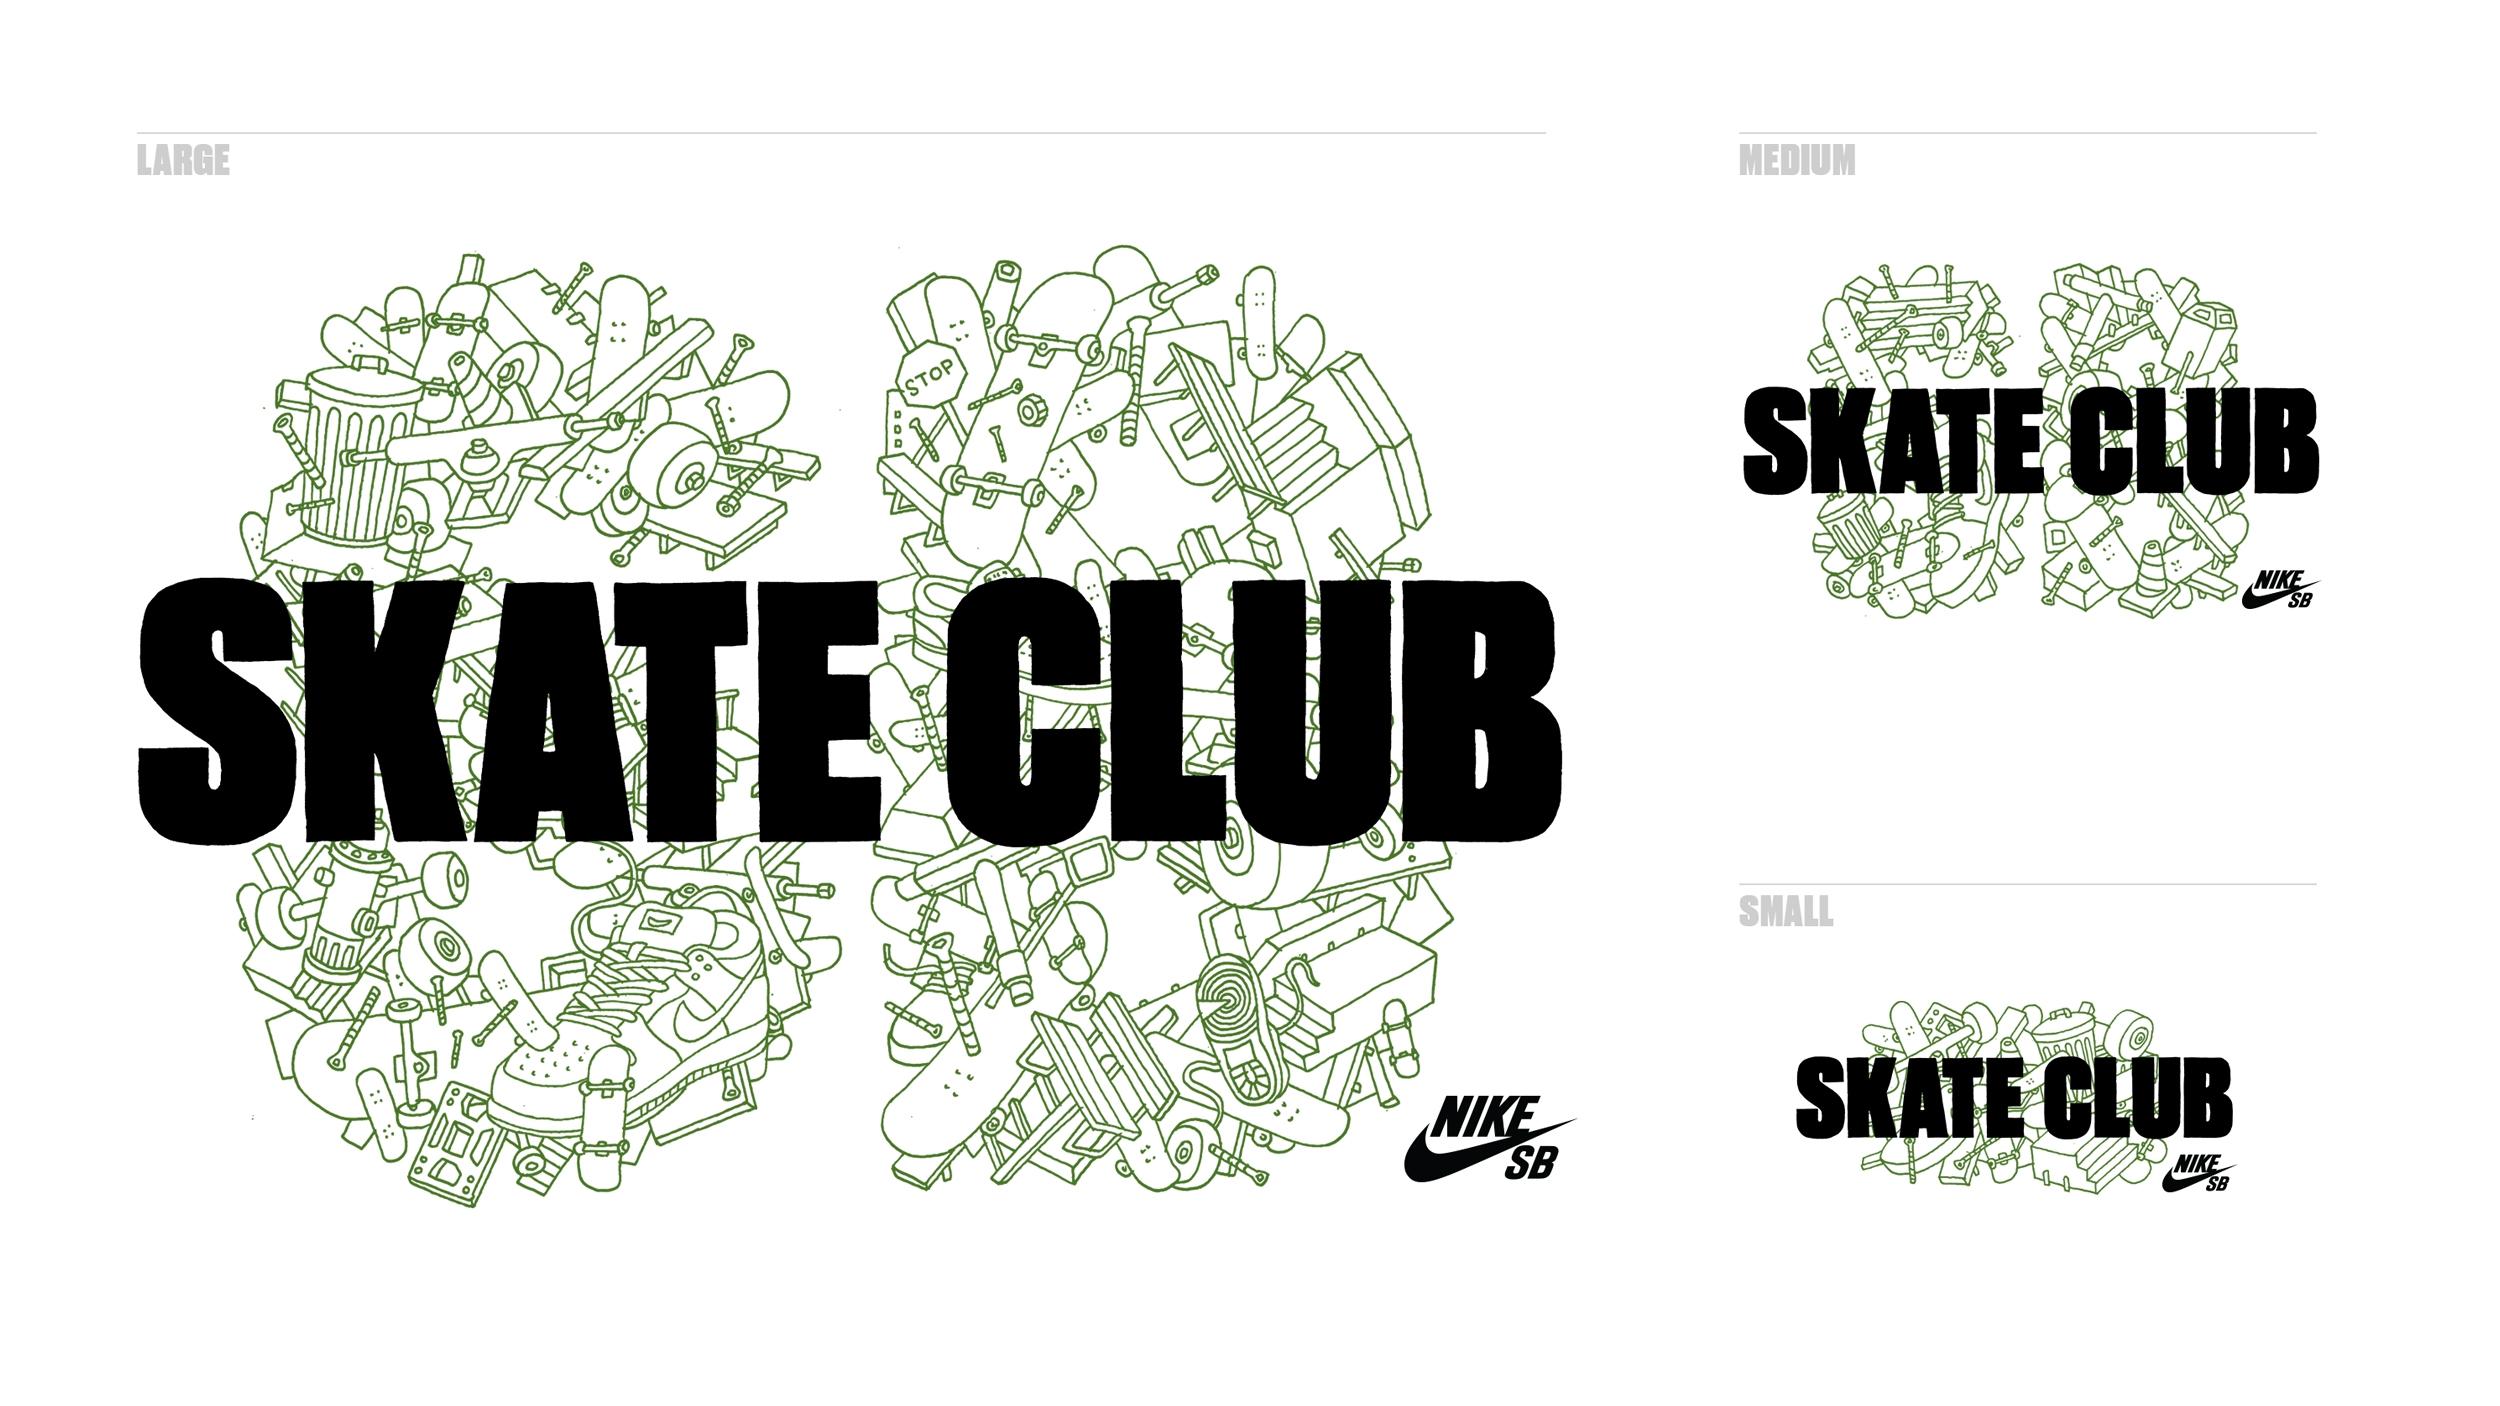 Tomi Lahdesmaki - Nike SB Image 2